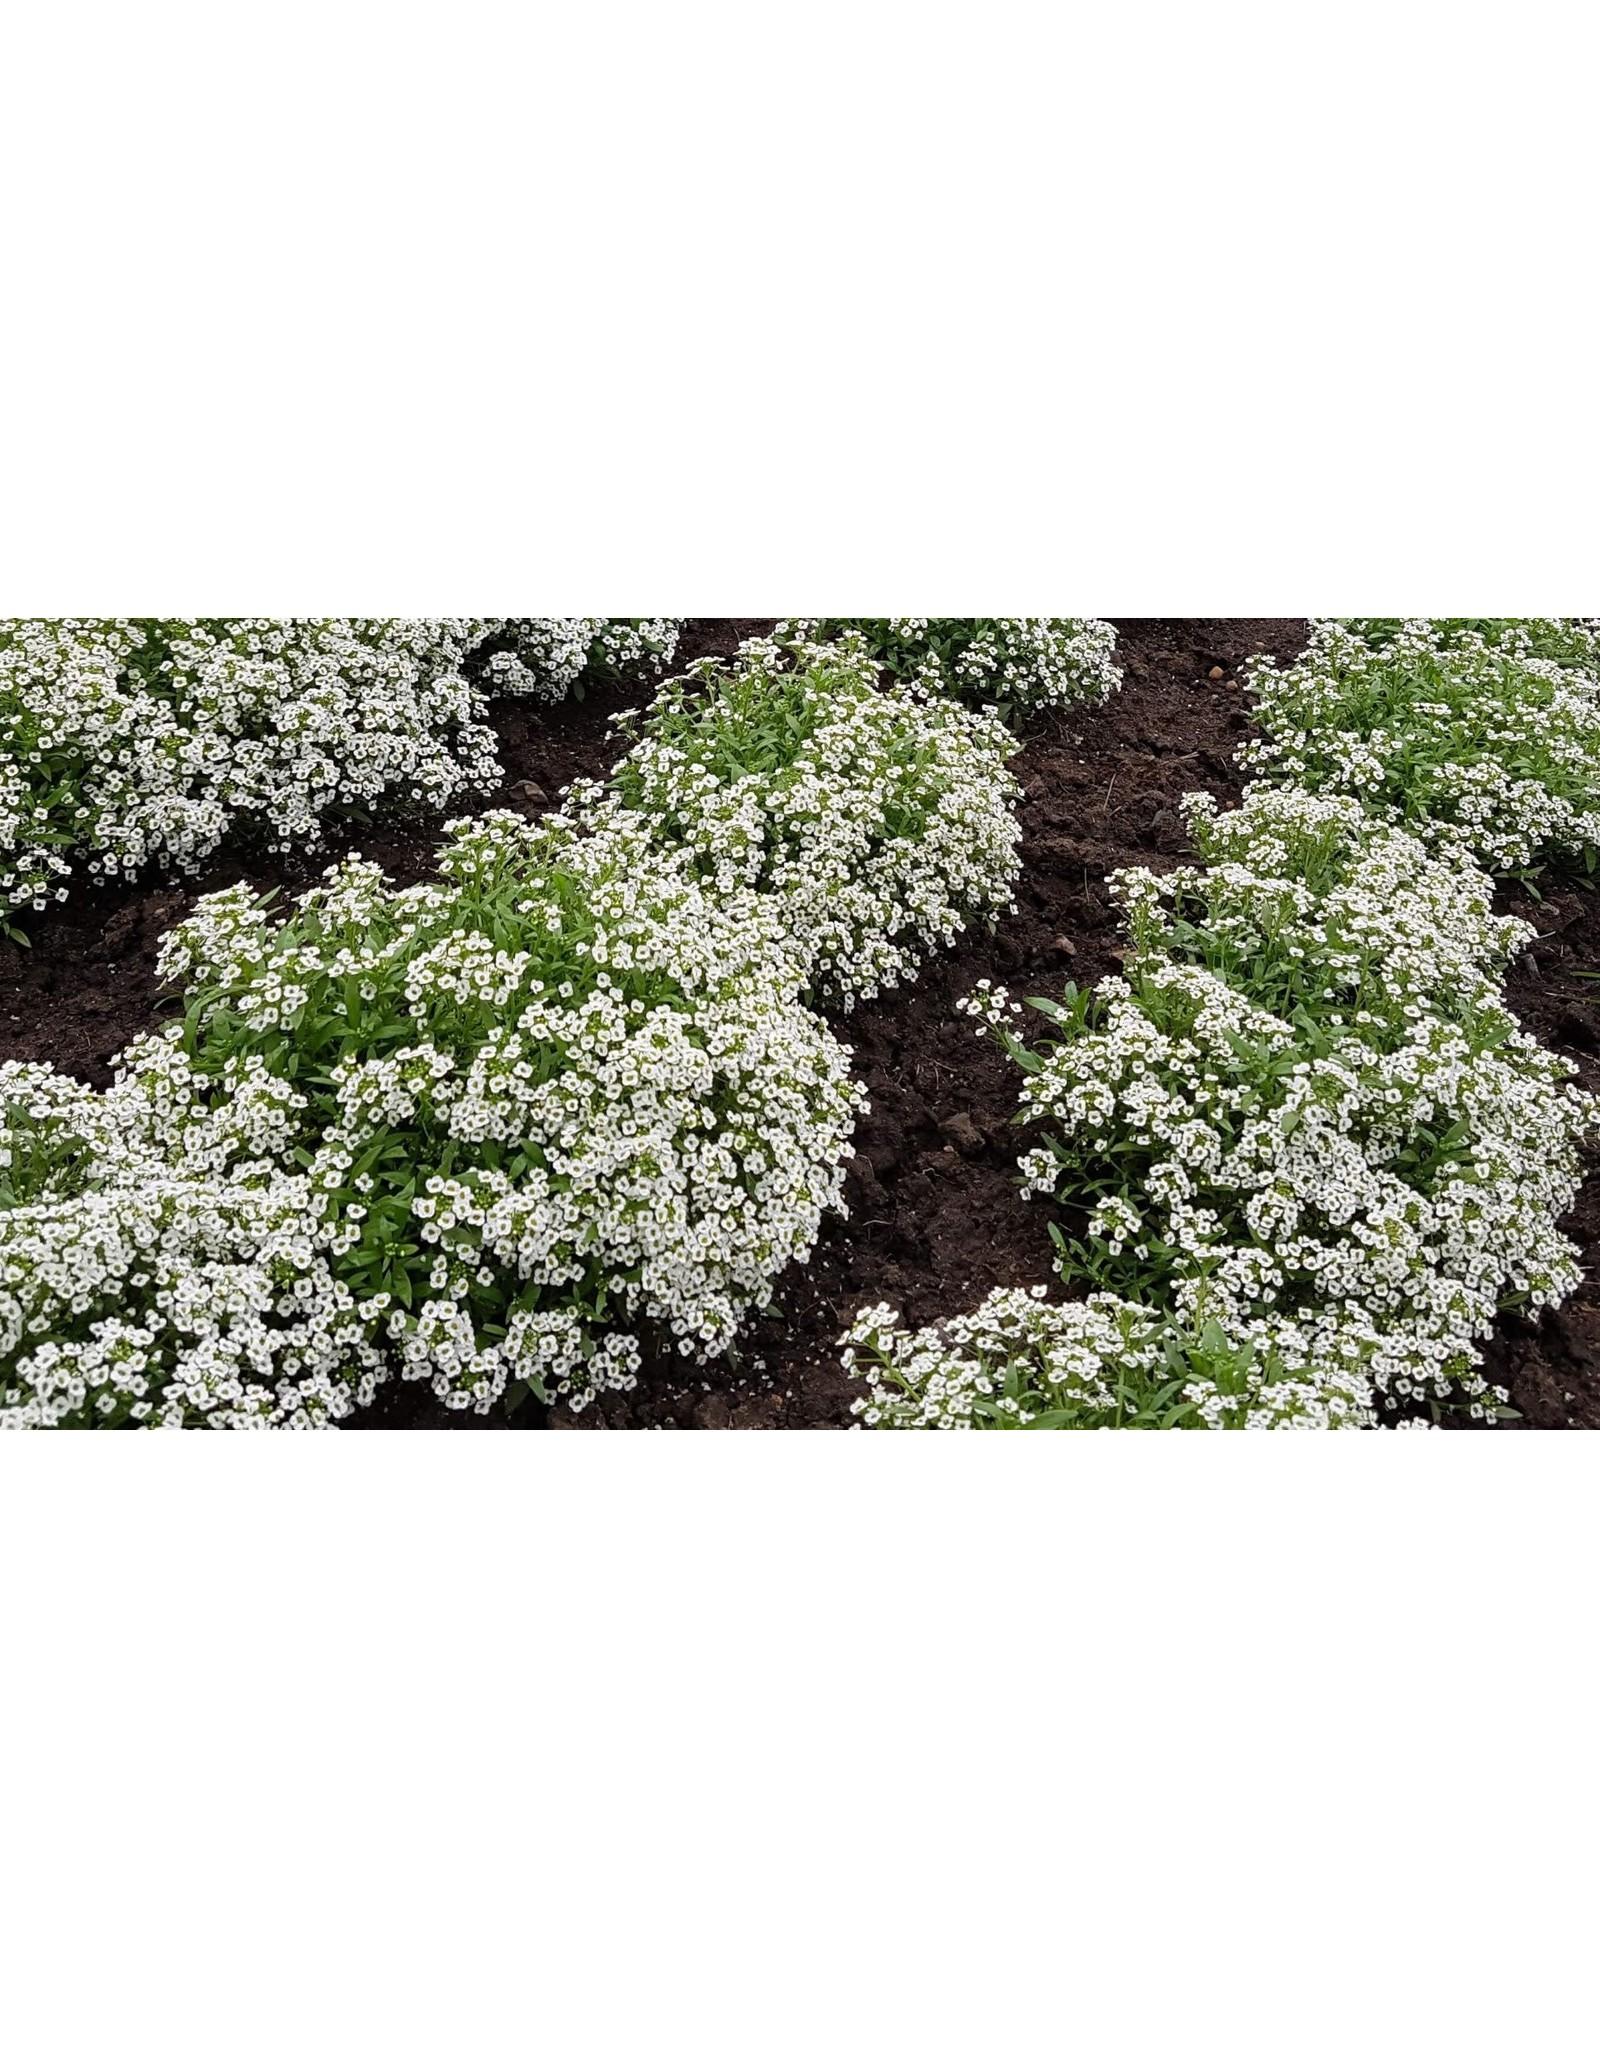 Carpet of Snow Alyssum Seeds 5005